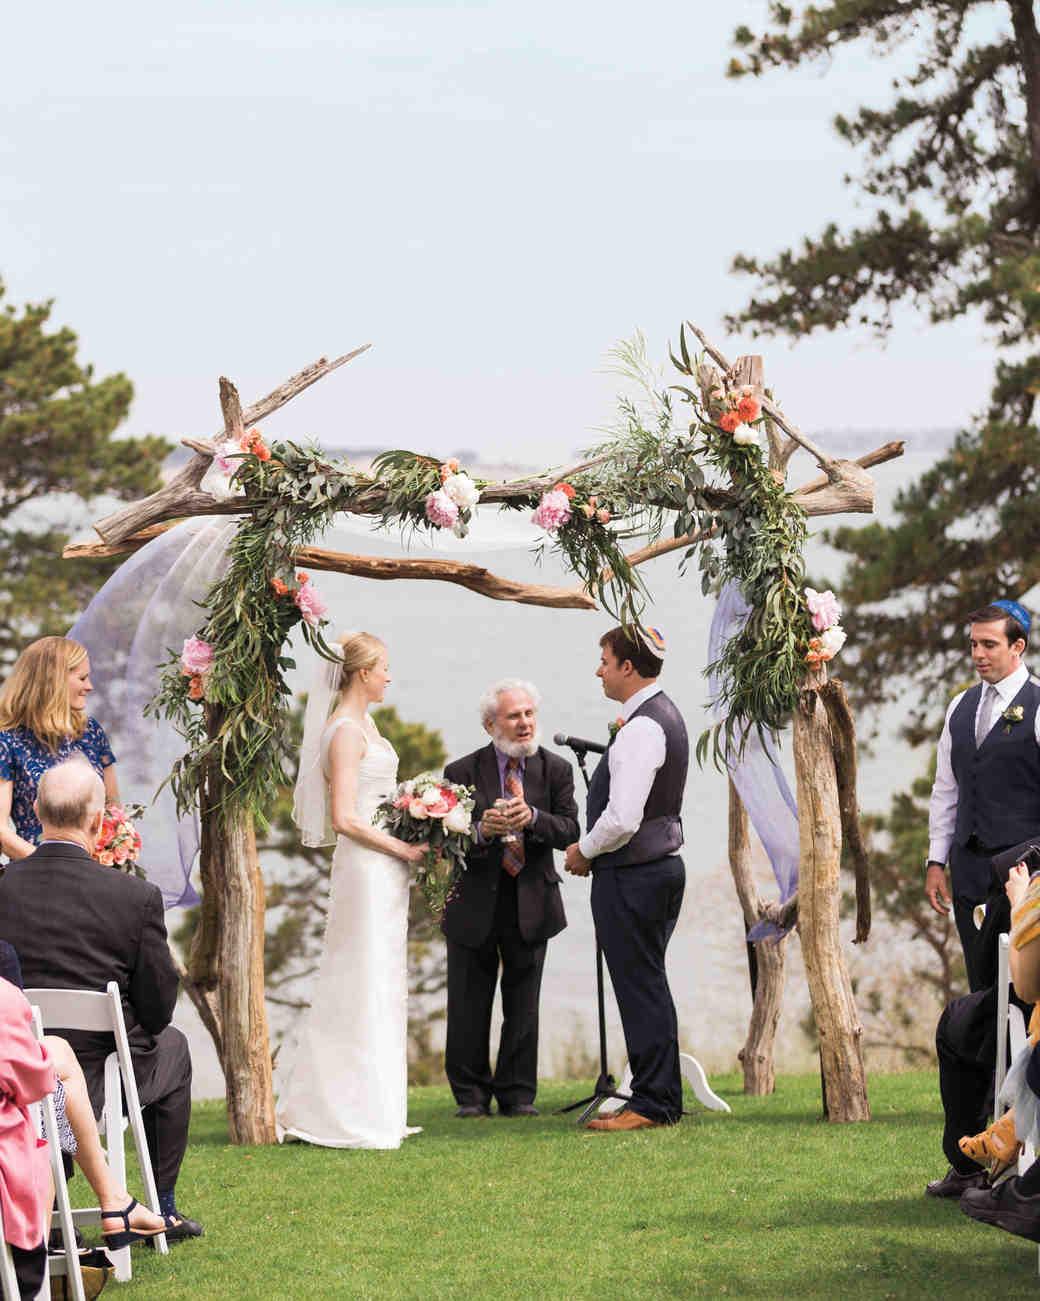 emily-justin-wedding-cape-cod-201-s111843.jpg